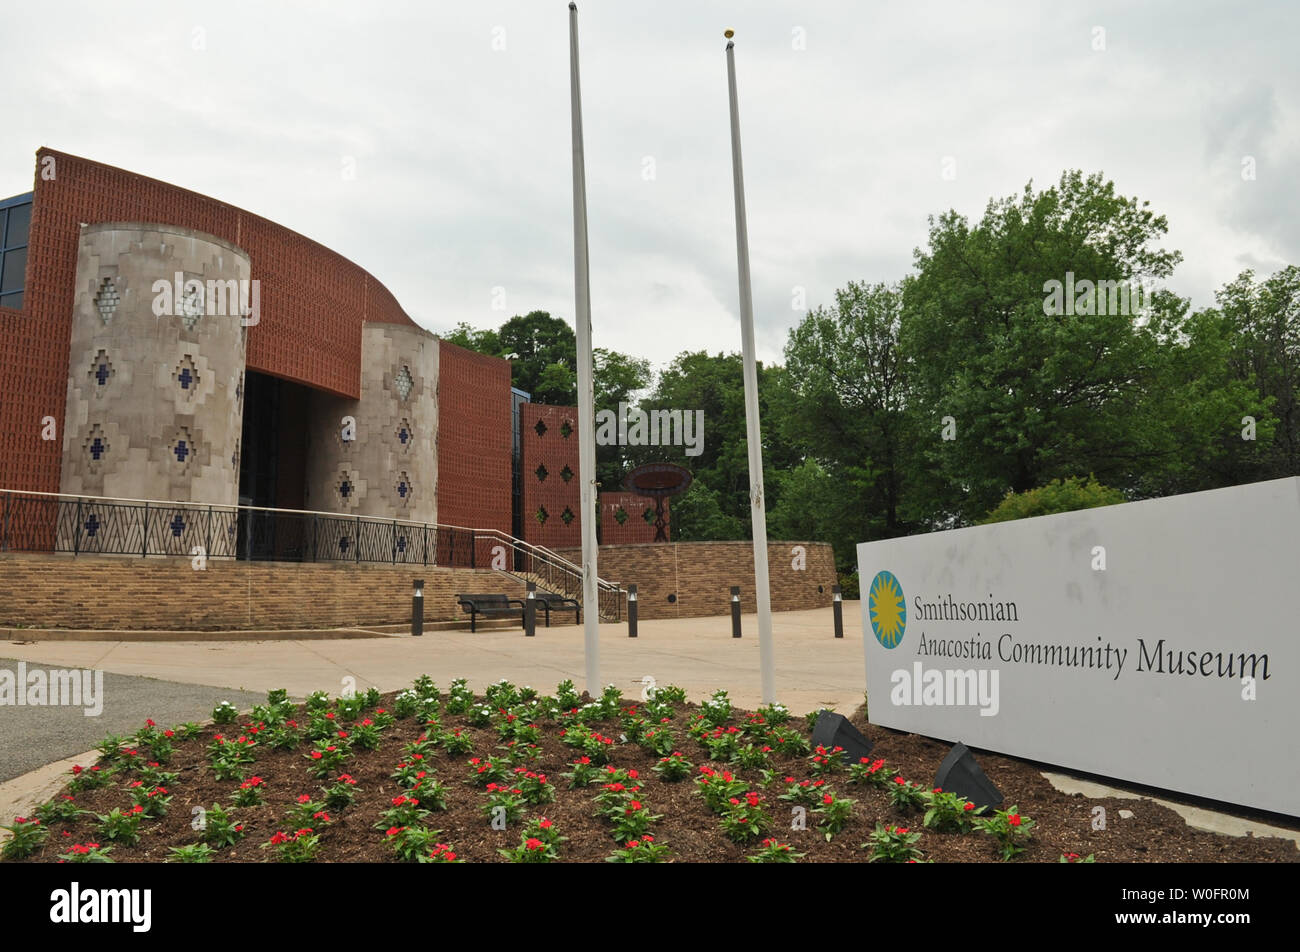 The Smithsonian Anacostia Community Museum is seen in Washington on May 22, 2010. UPI/Alexis C. Glenn Stock Photo